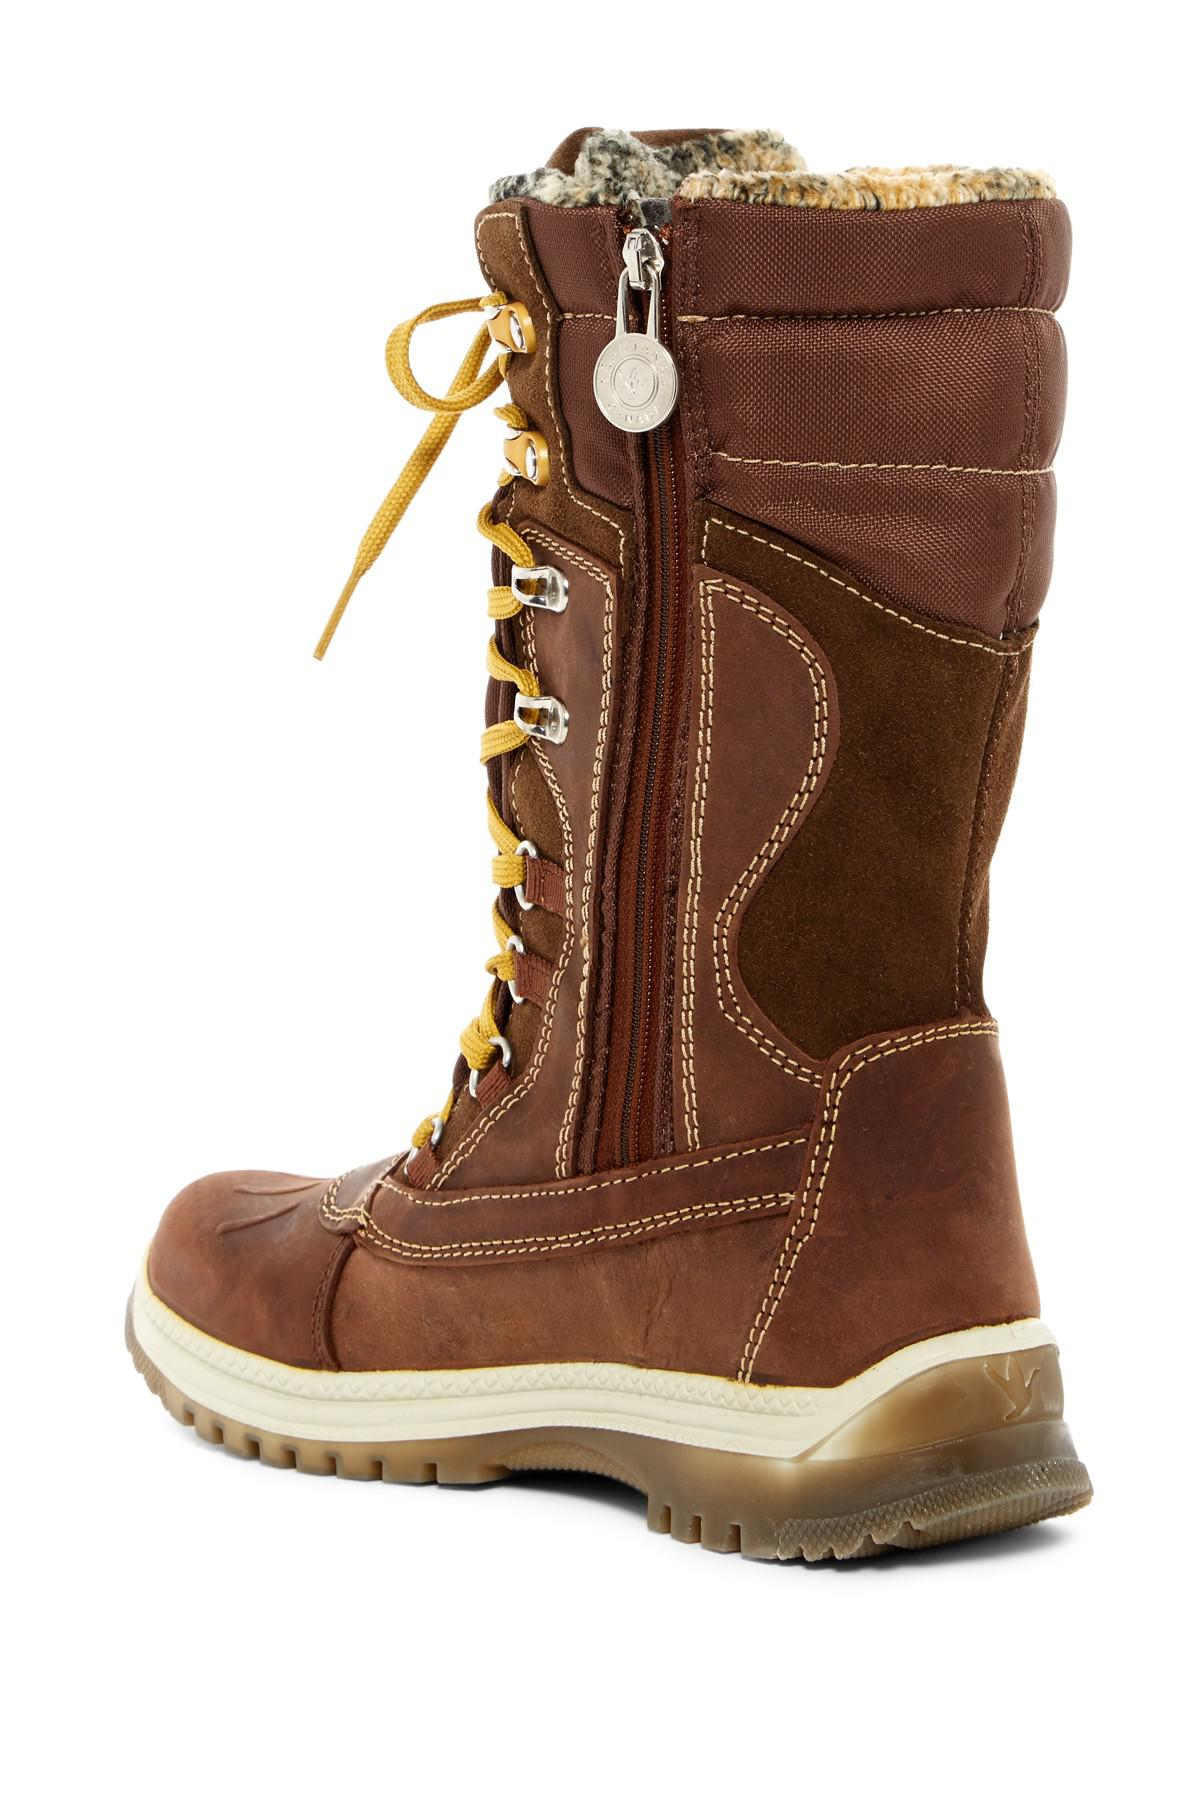 4d1de3dc11d Santana Canada - Brown Modena Wool Lined Waterproof Boot - Lyst. View  fullscreen